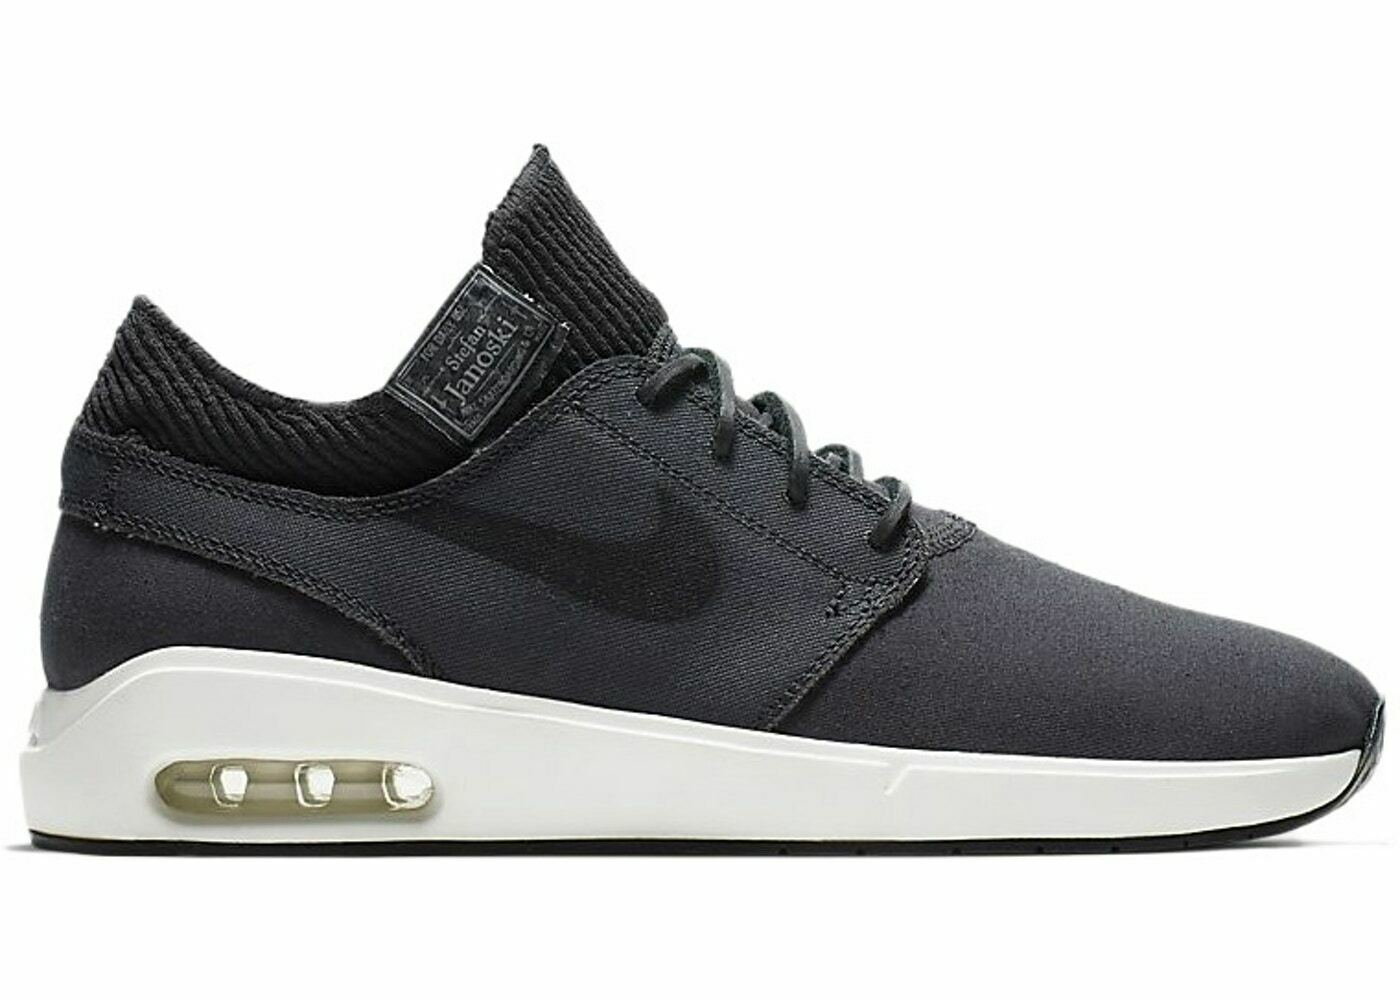 Size 9 - Nike SB Air Max II Janoski Premium Anthracite 2019 for ...